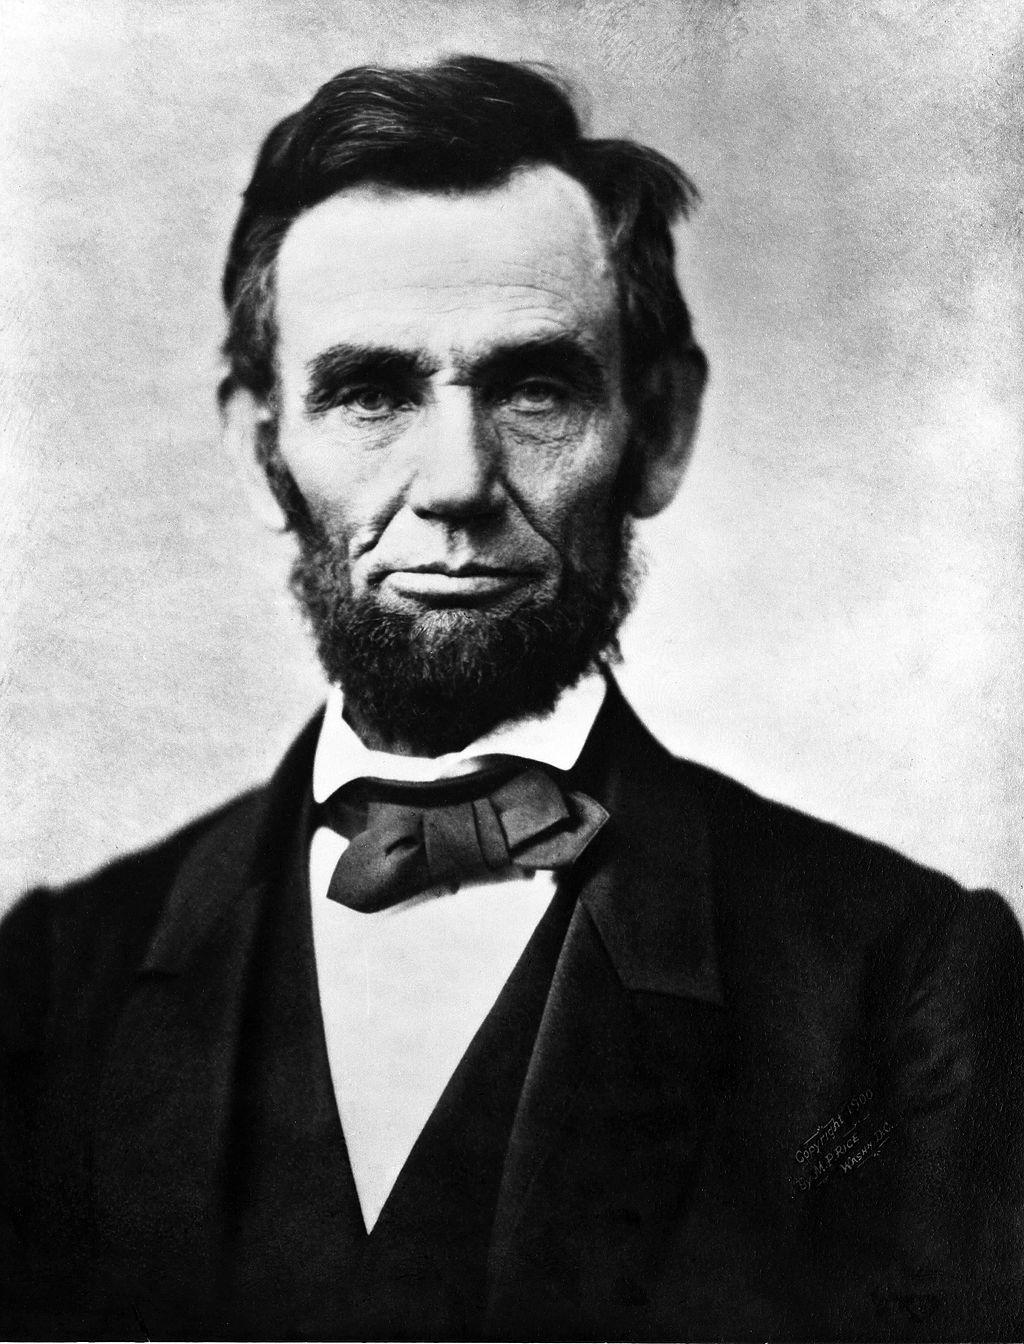 Abraham_Lincoln_head_on_shoulders_photo_portrait